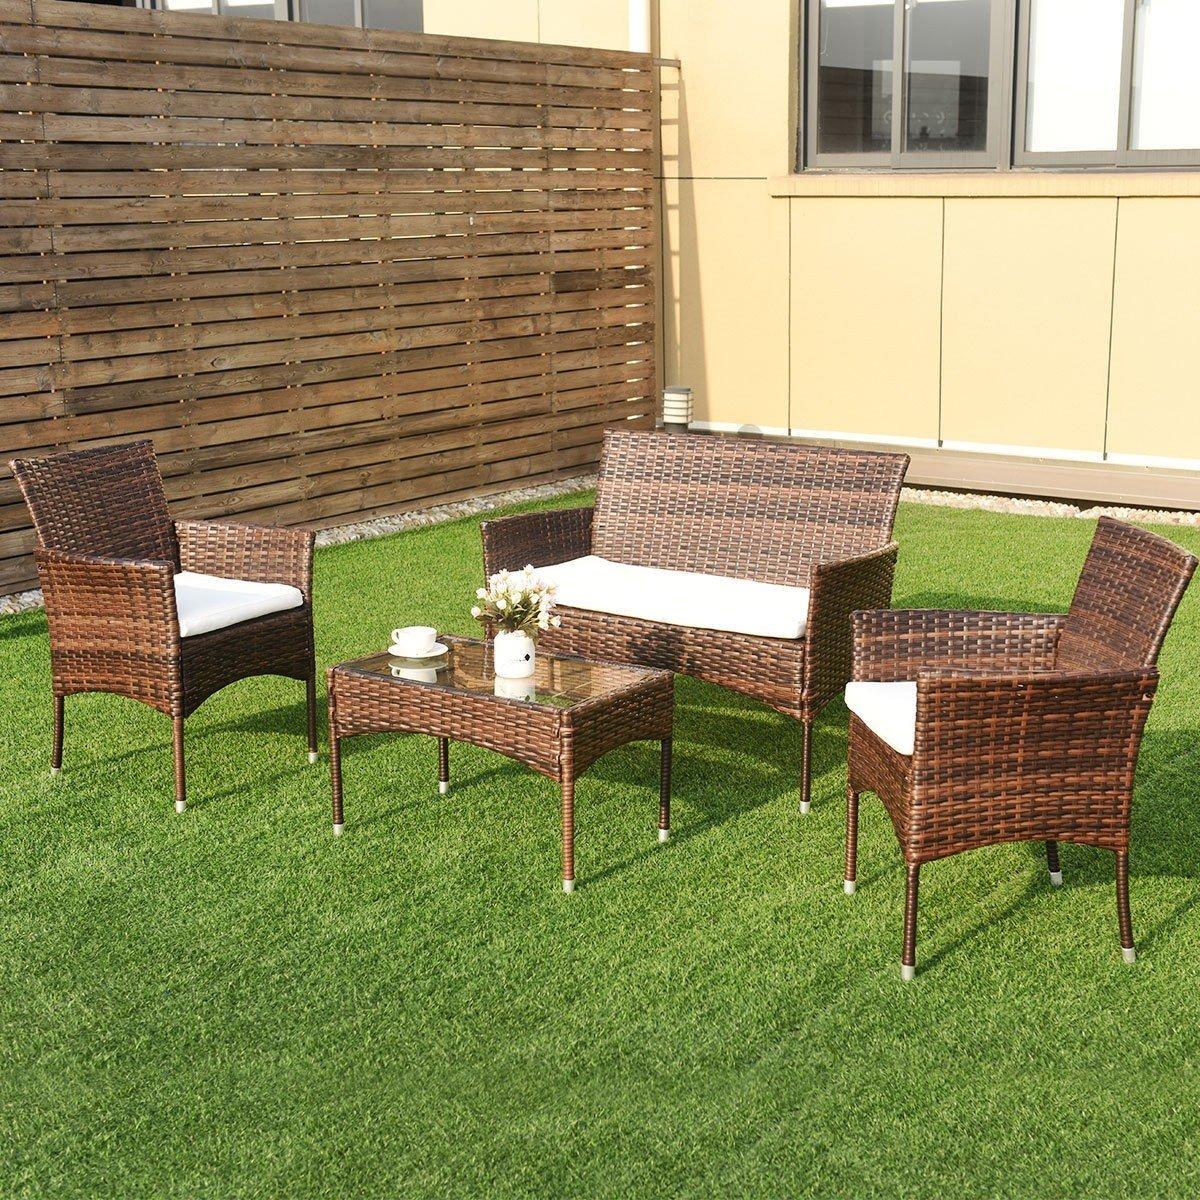 EnjoyShop 4 Pcs PE Rattan Wicker Table Shelf Sofa Furniture Set with Cushion Dining Garden Picnic Outdoor by EnjoyShop (Image #6)